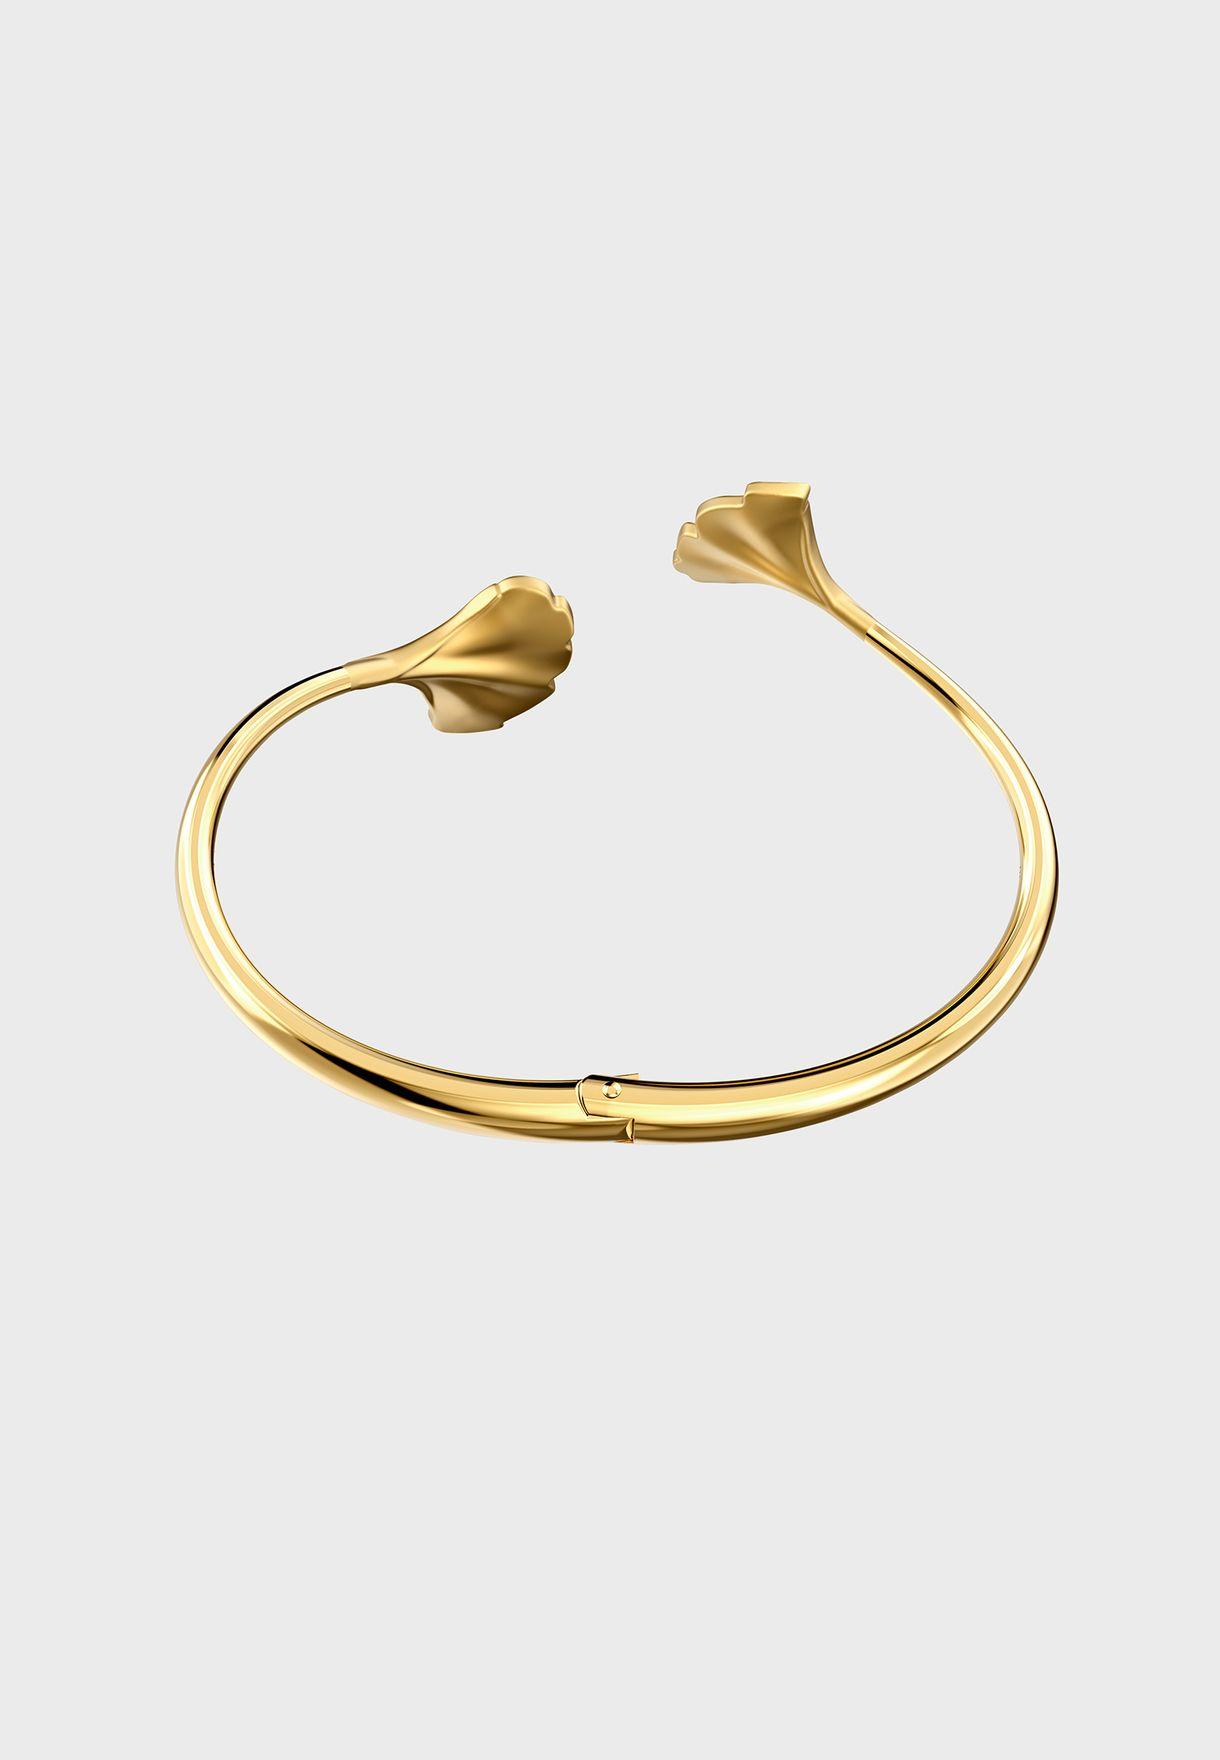 Stunning Ginko Cuff Bracelet